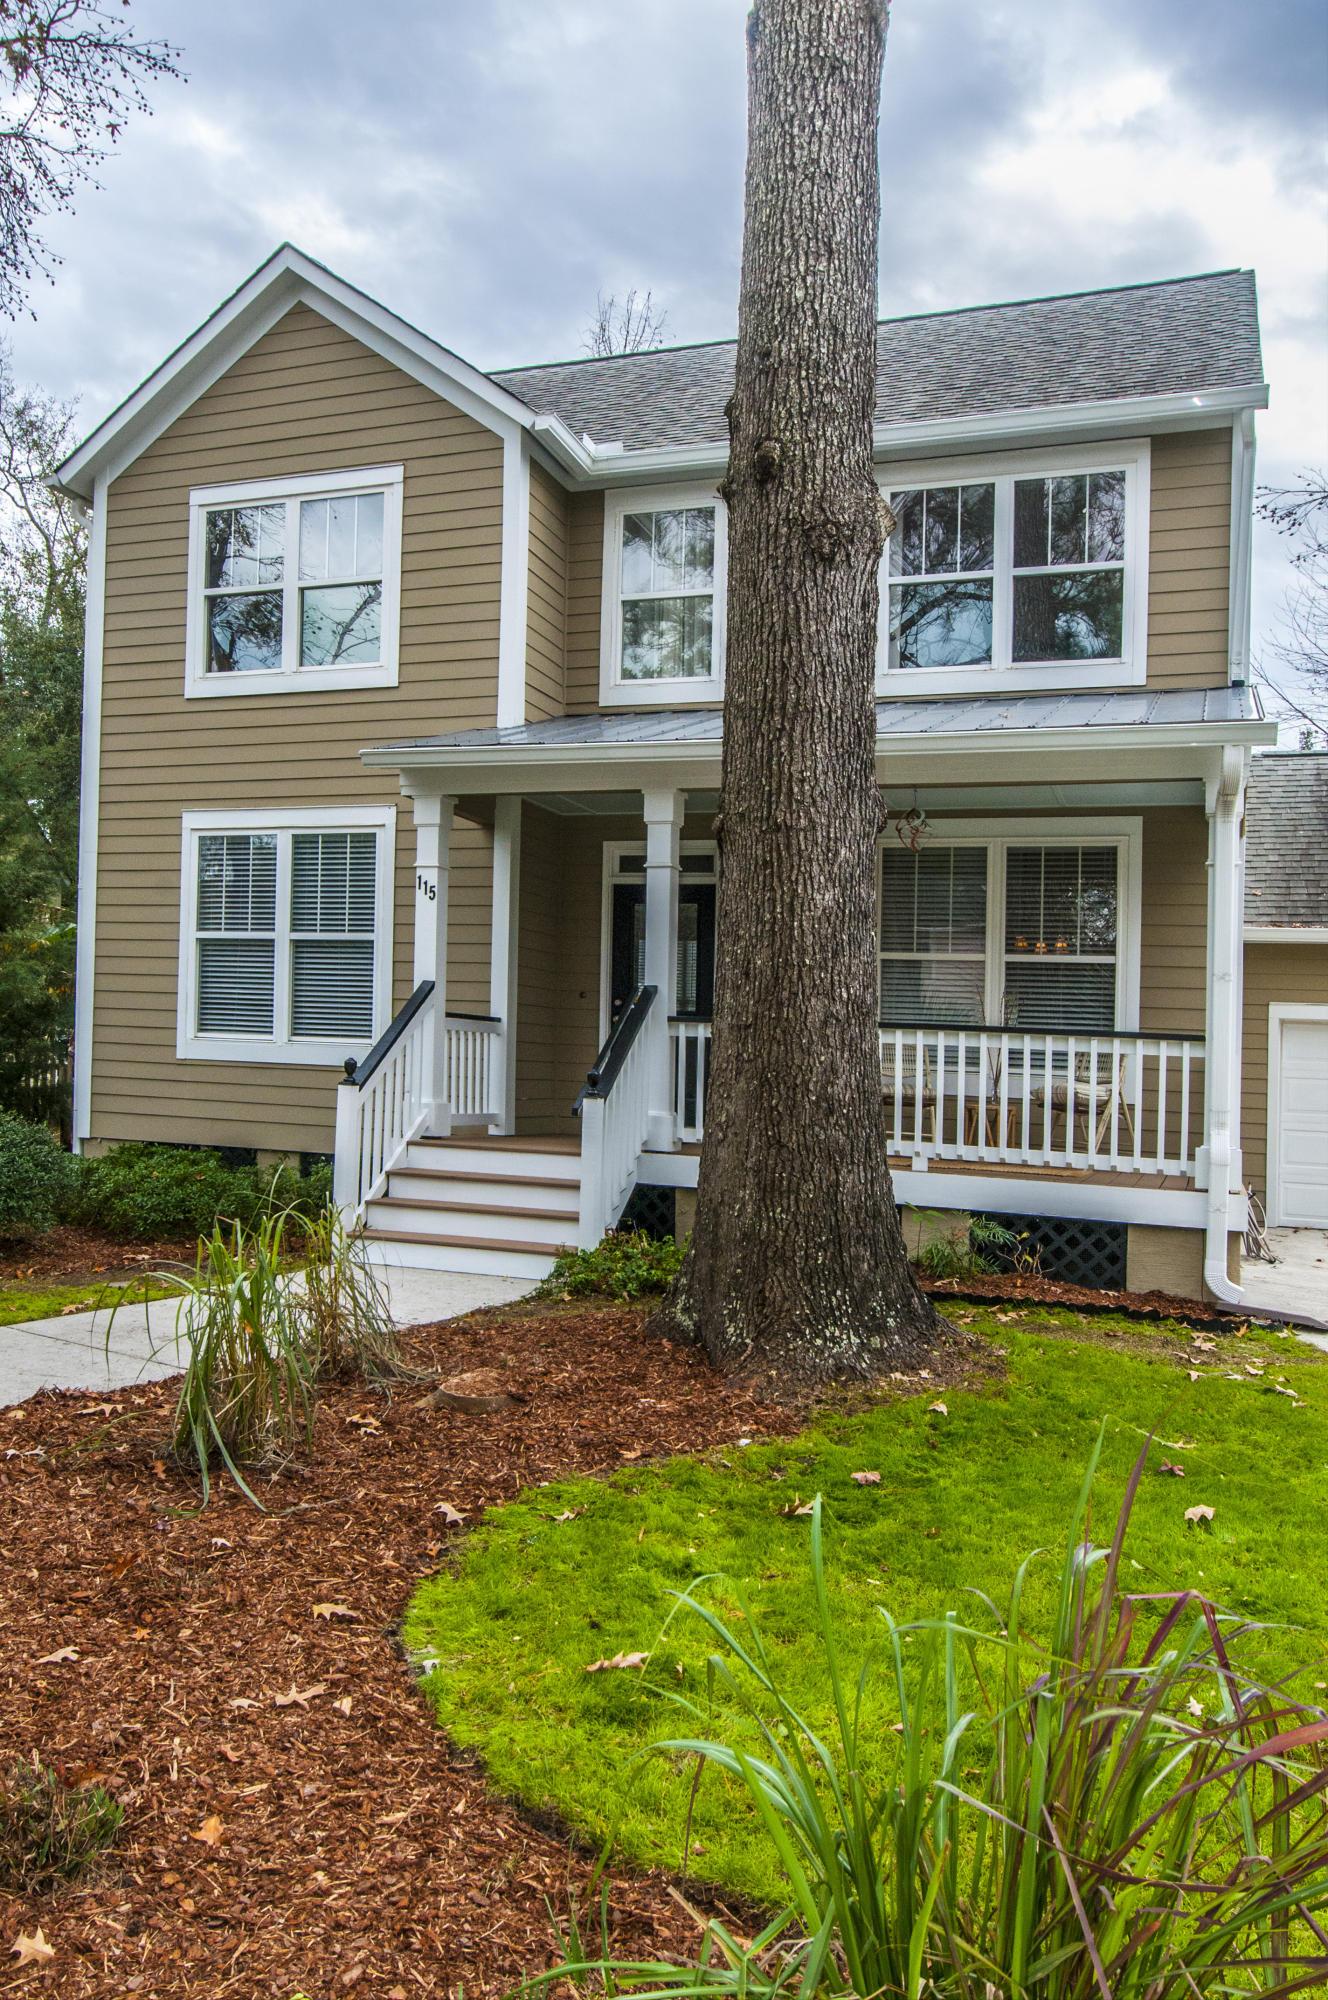 Etiwan Park Homes For Sale - 115 Brady, Daniel Island, SC - 21